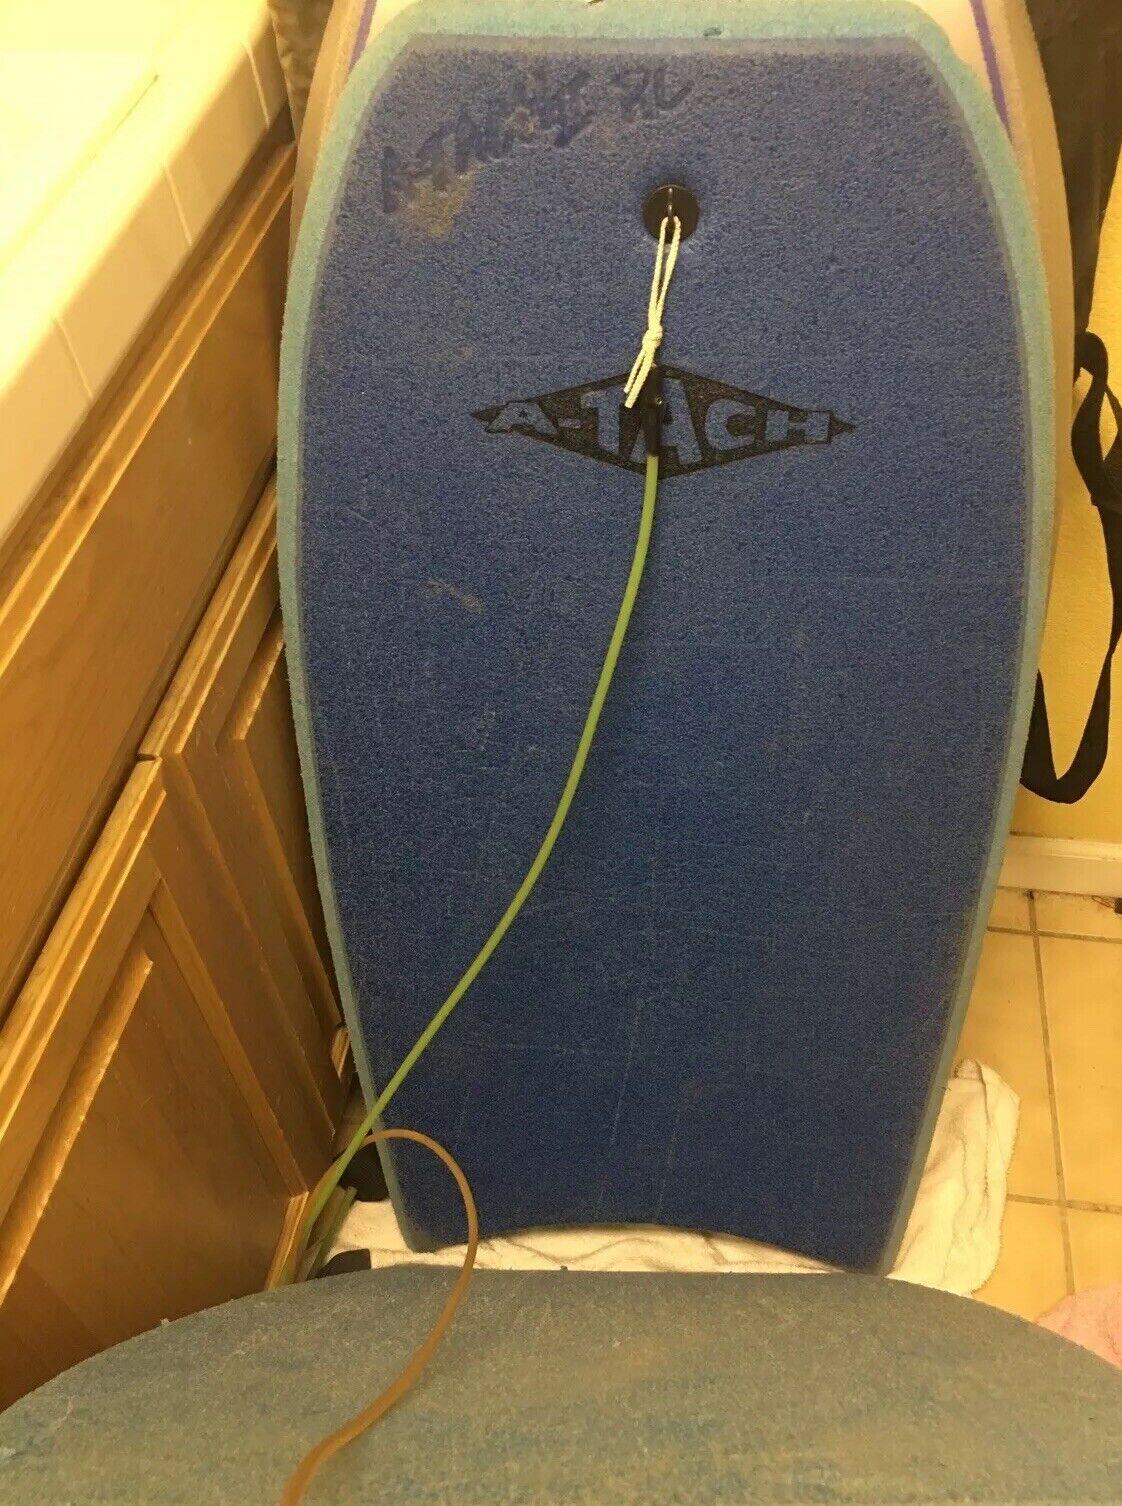 Atach Bodyboard Lote (2) Vintage Raro